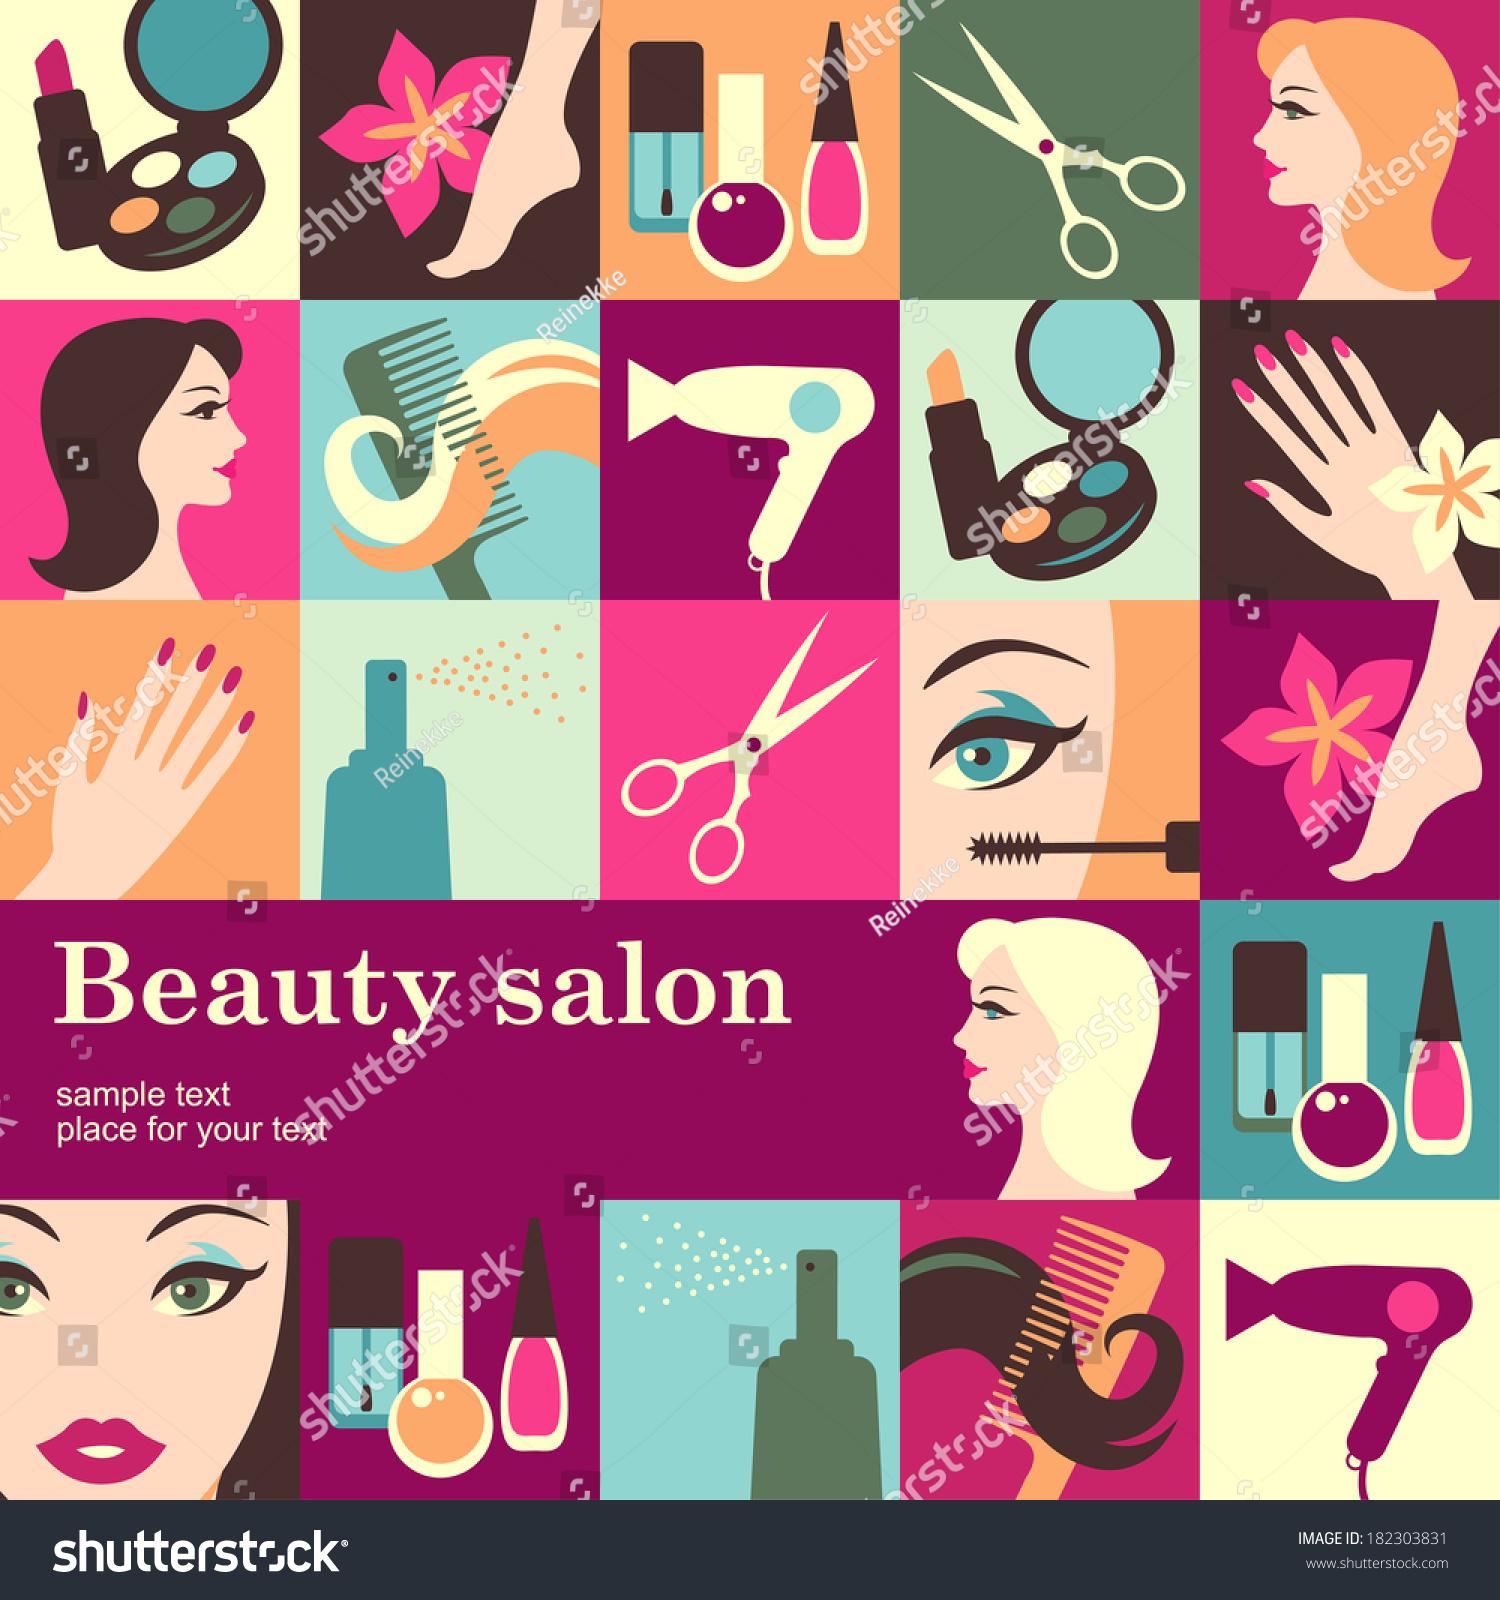 Nails Art Beauty Salon Background Stock Vector: Beauty Salon Design Template Card Vector Stock Vector